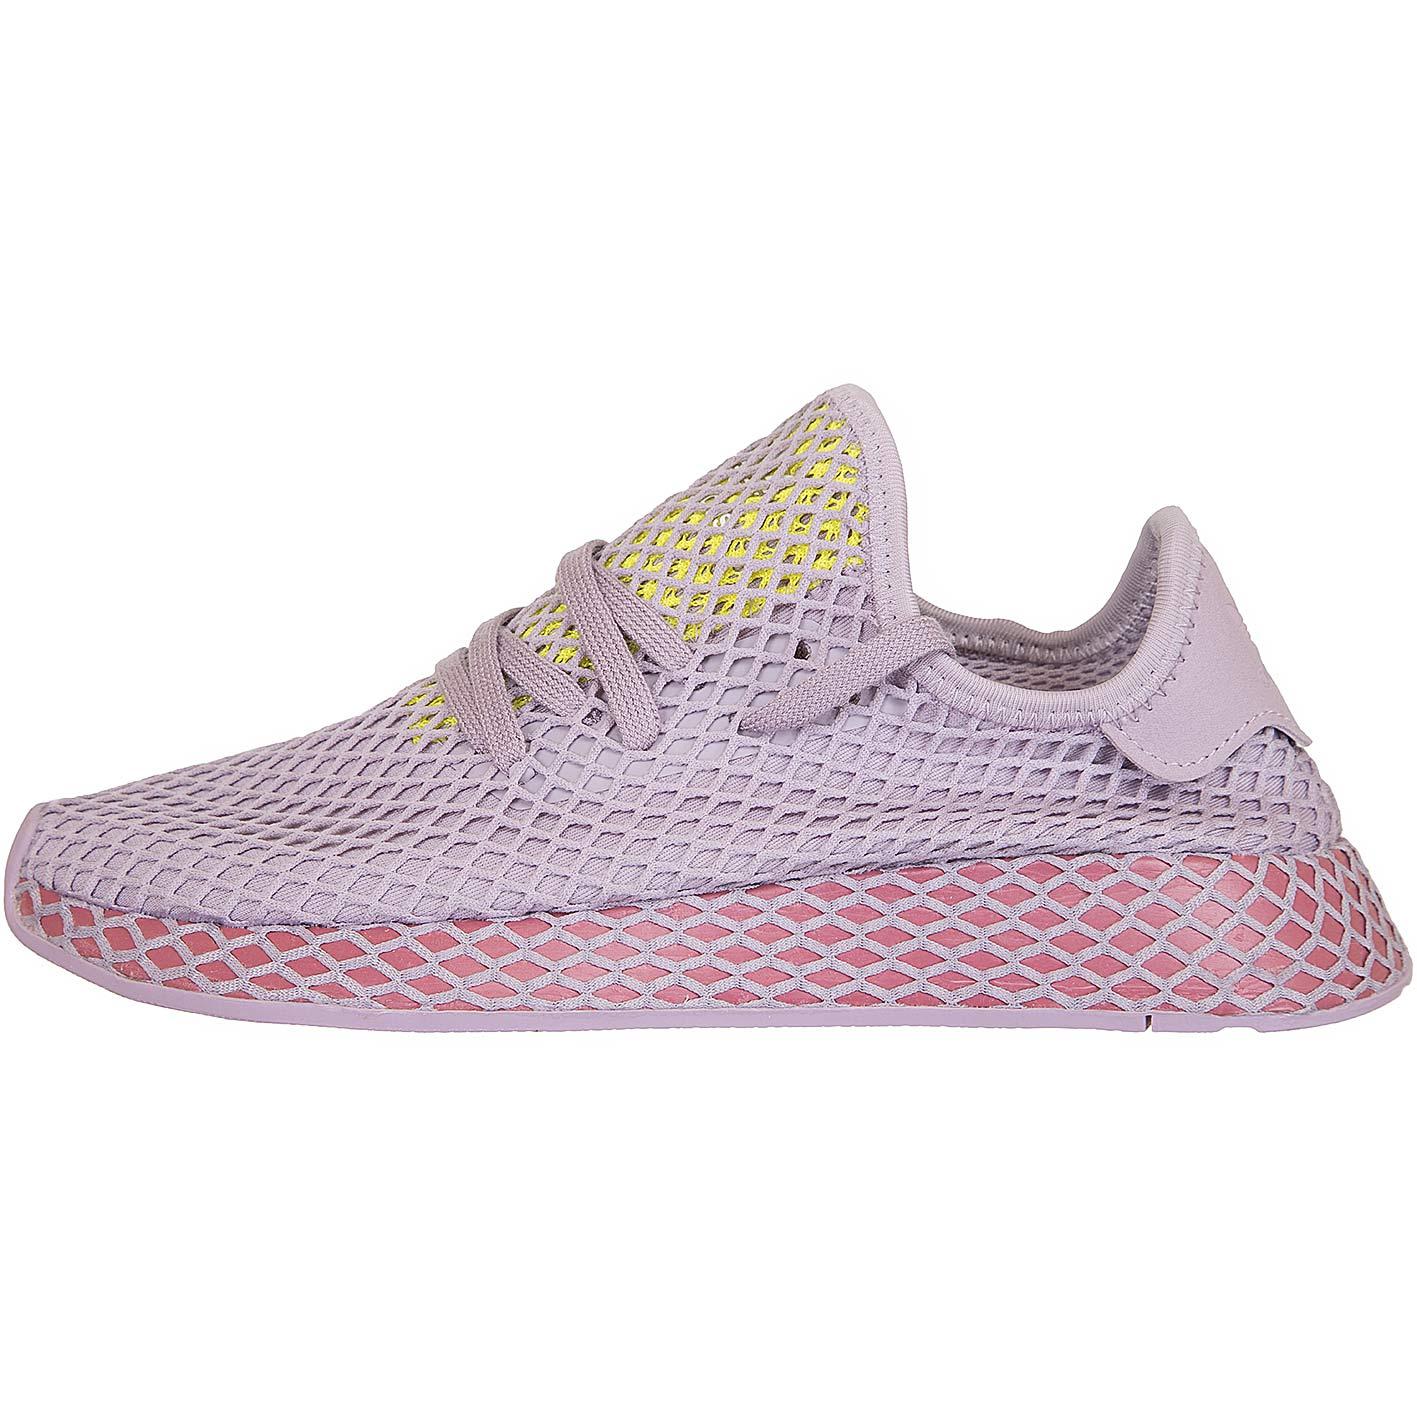 Deerupt Originals Adidas Sneaker Runner Lila Damen qGpUSzMV